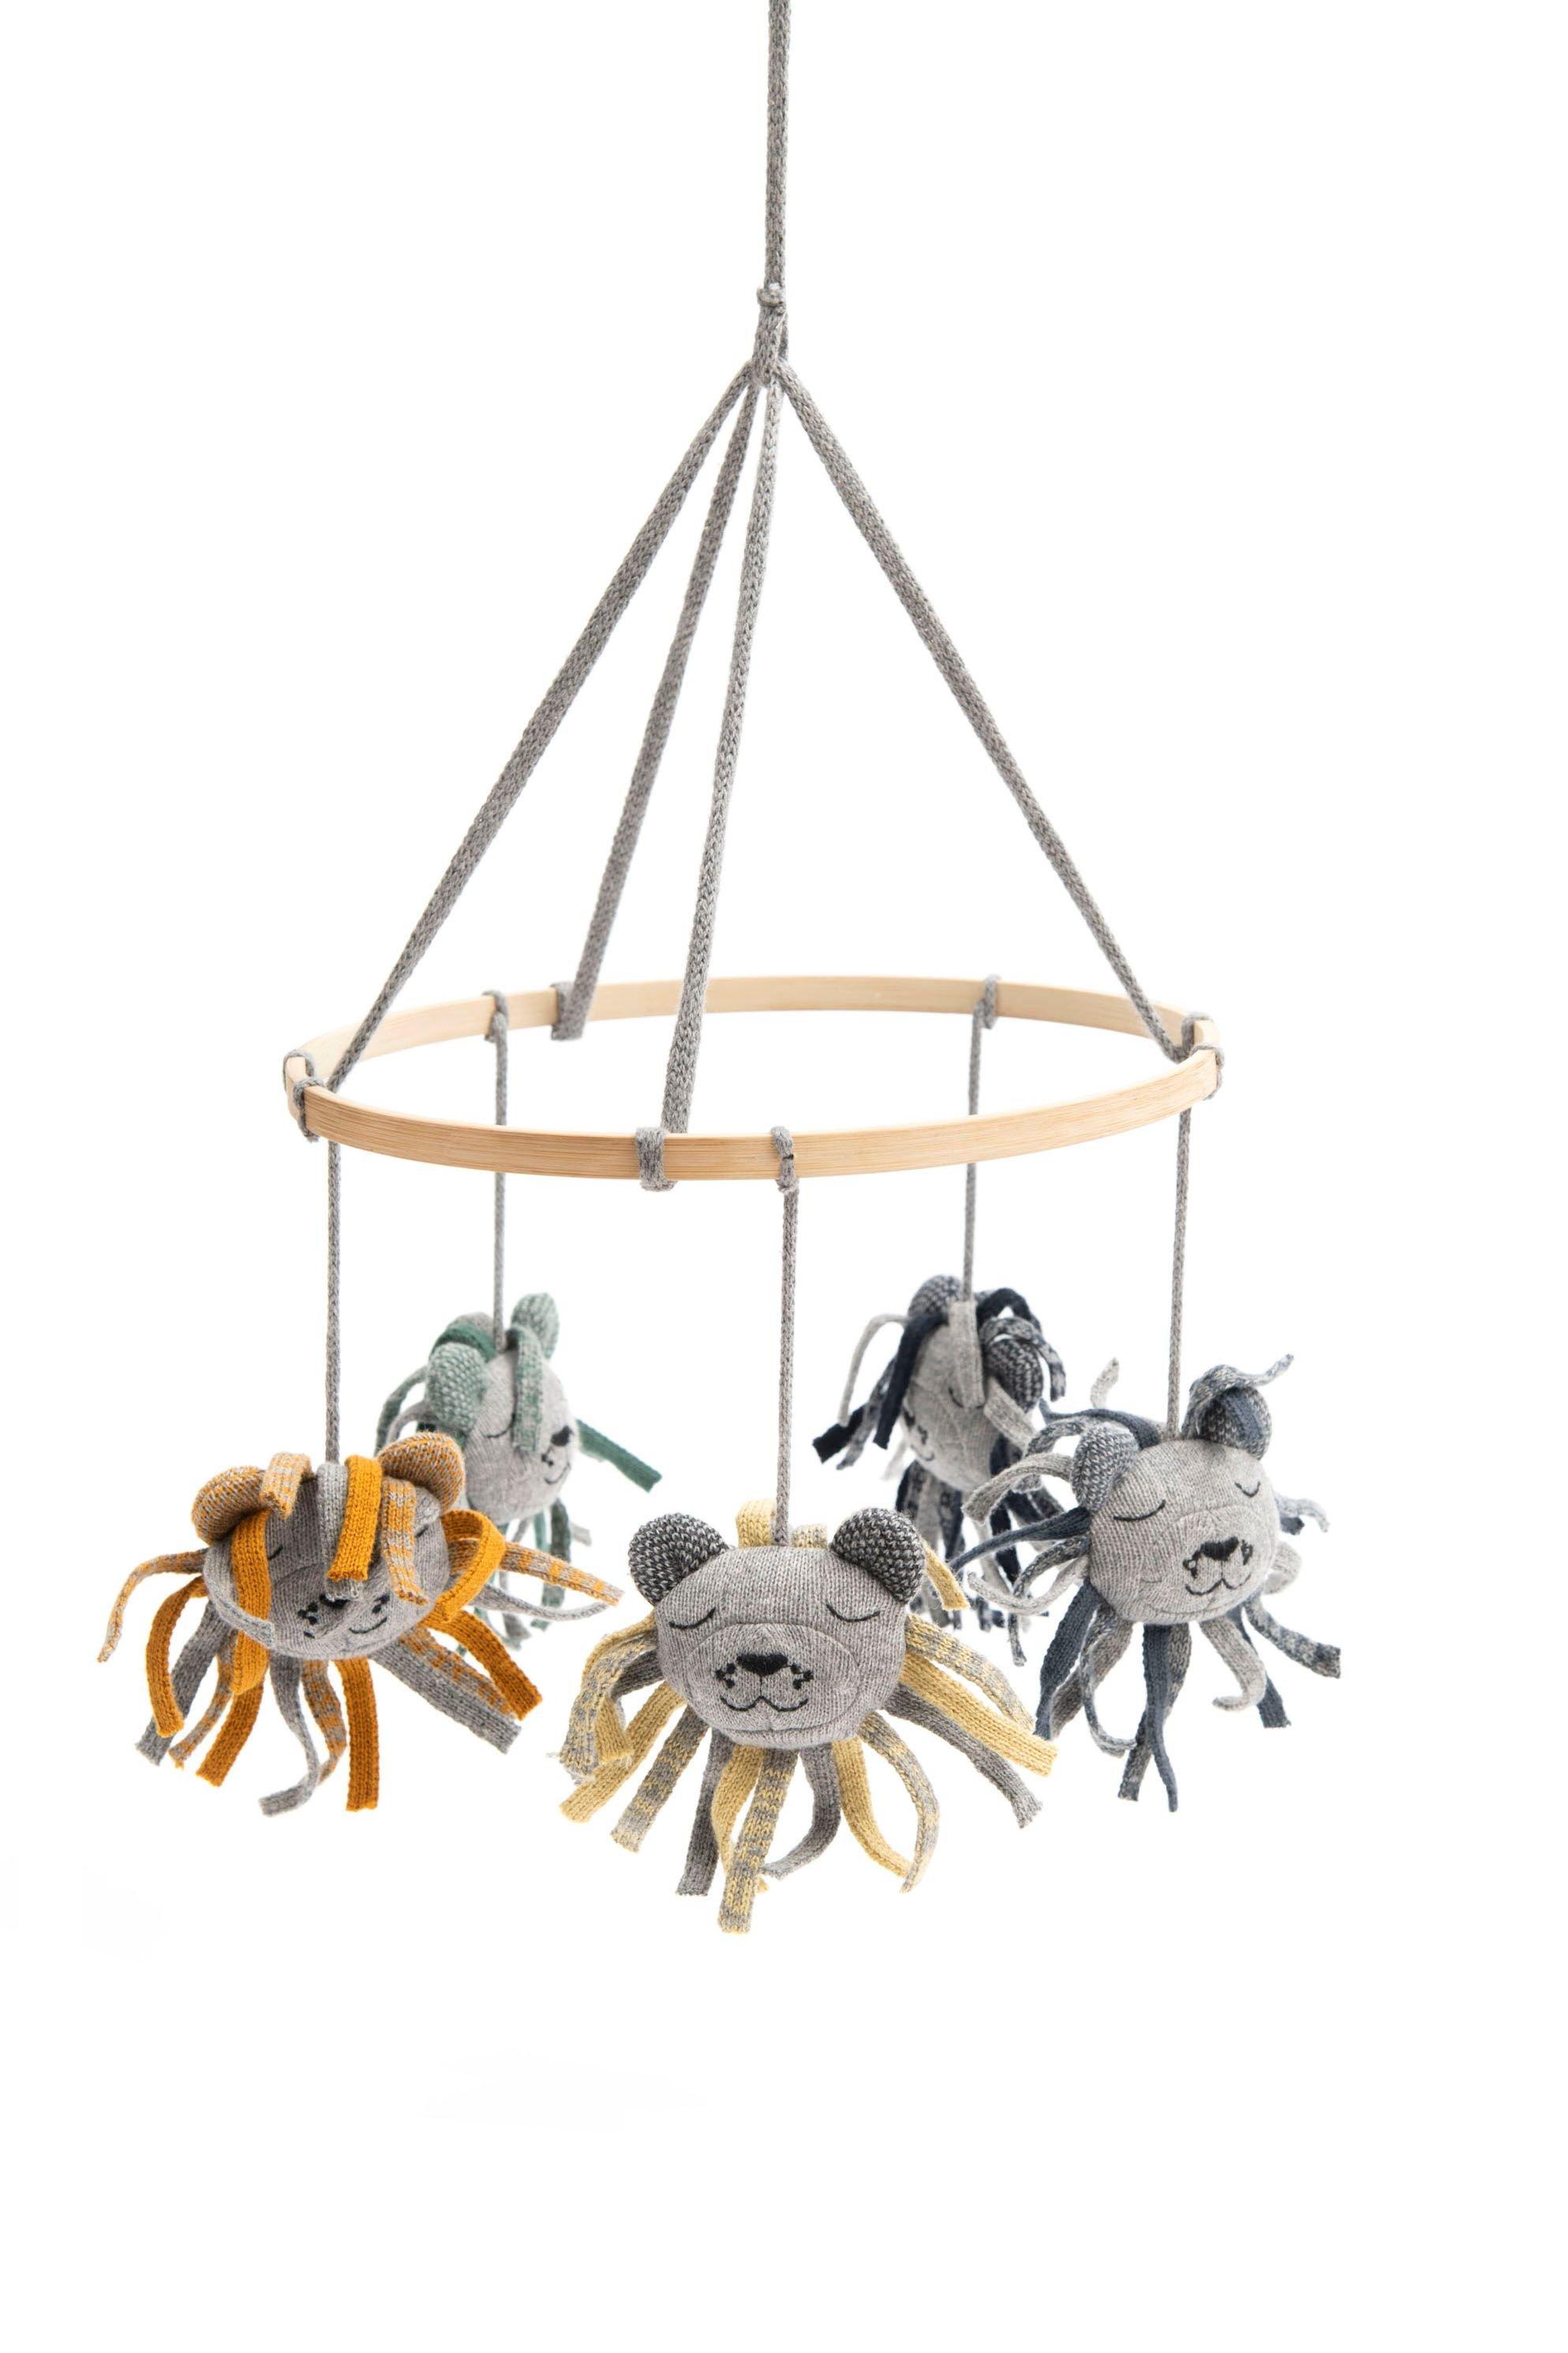 Smallstuff - Hanging Mobile - Multi Lion